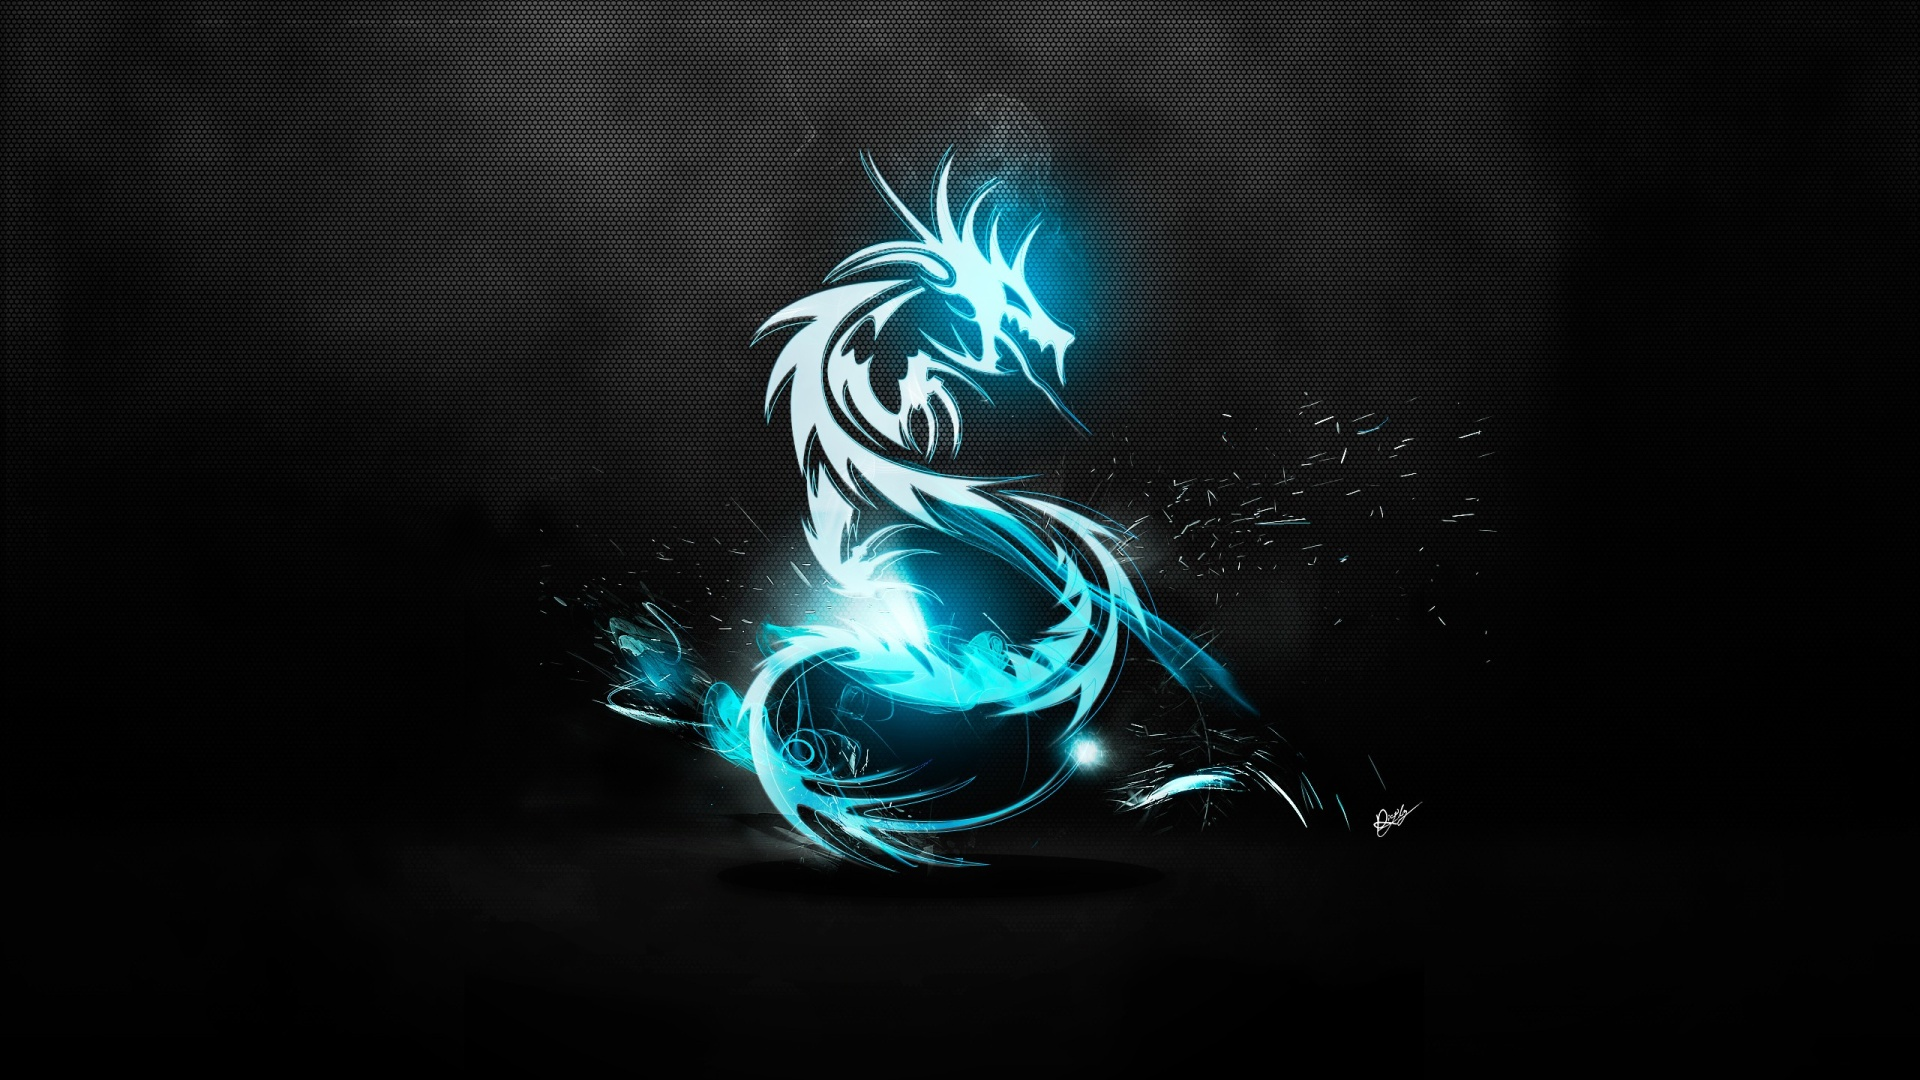 Blue dragon full hd desktop wallpapers 1080p - Dragon backgrounds ...